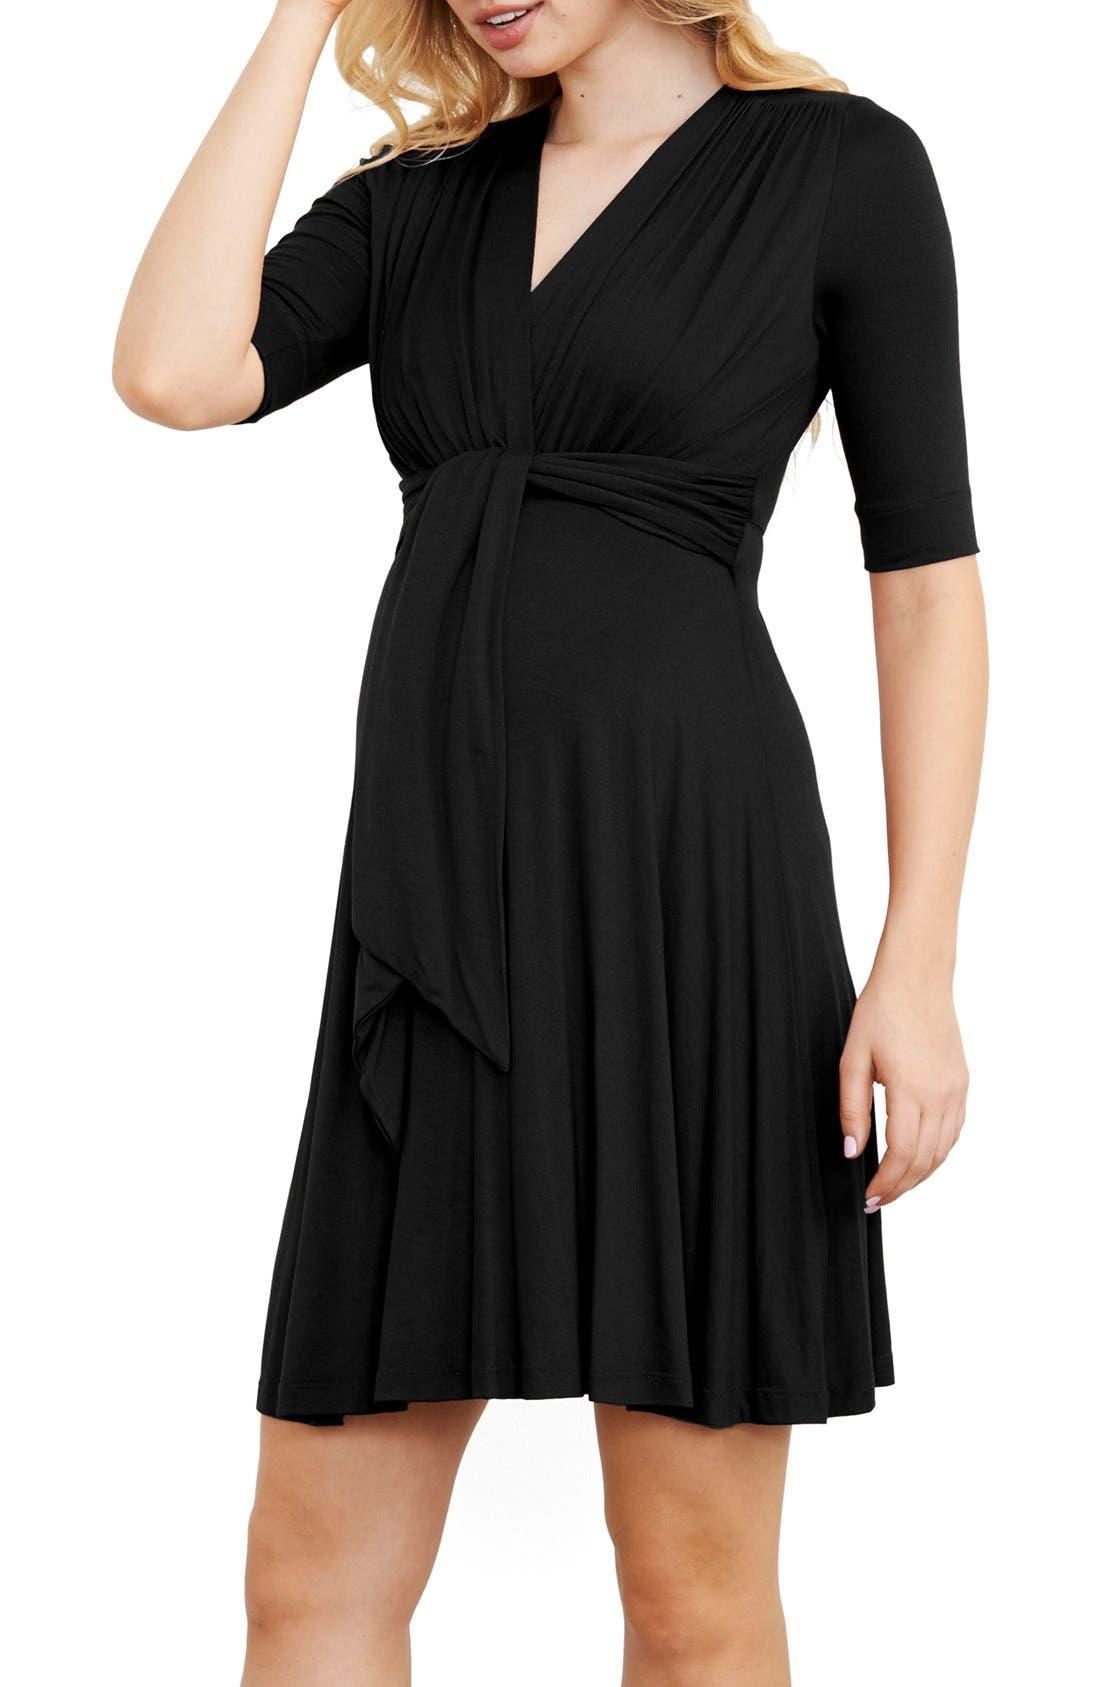 Maternal America Maternity Tie Front Dress